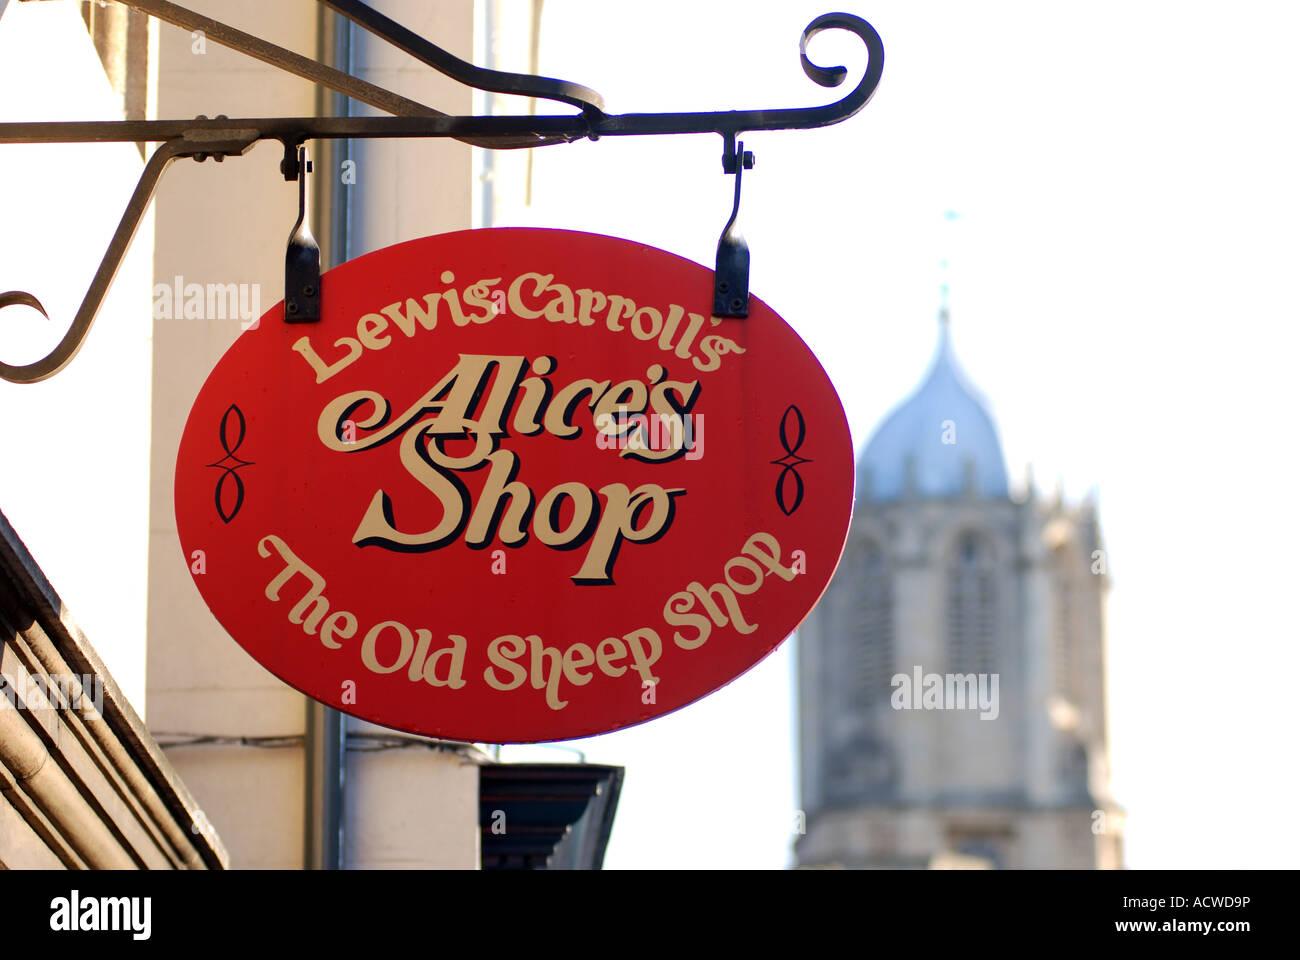 Alice`s Shop sign, Oxford, Oxfordshire, England, UK - Stock Image